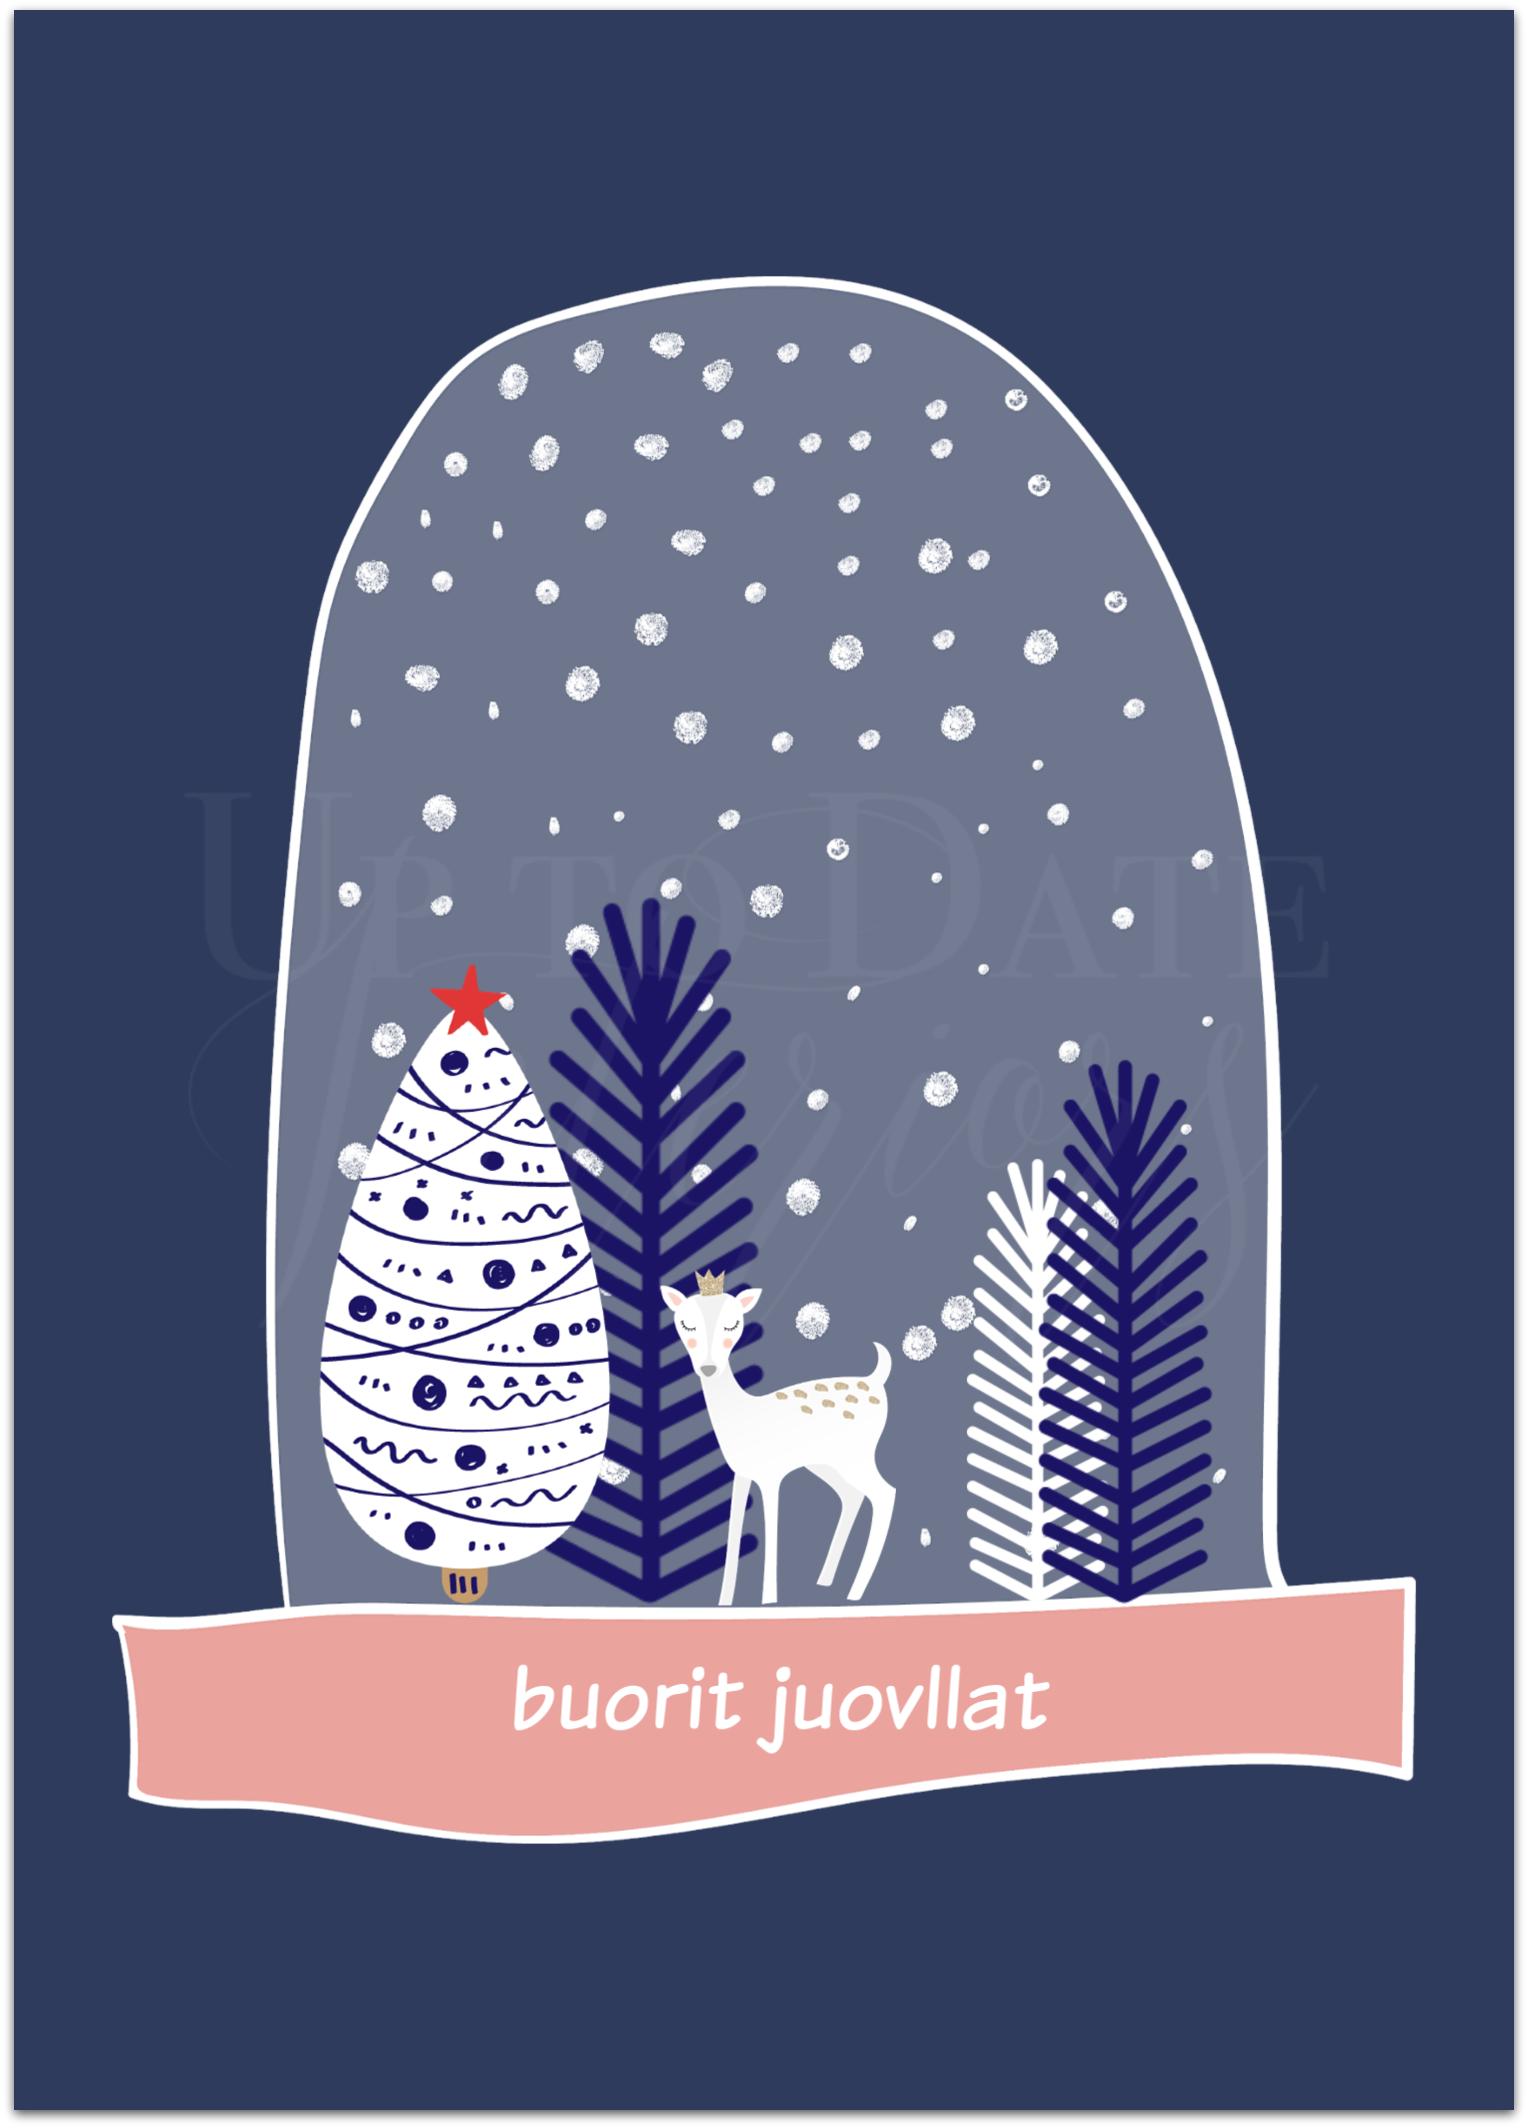 Free Christmas Scandinavian Printable Art For Easy Decor Up To Date Interiors Scandinavian Christmas Christmas Decor Diy Free Christmas